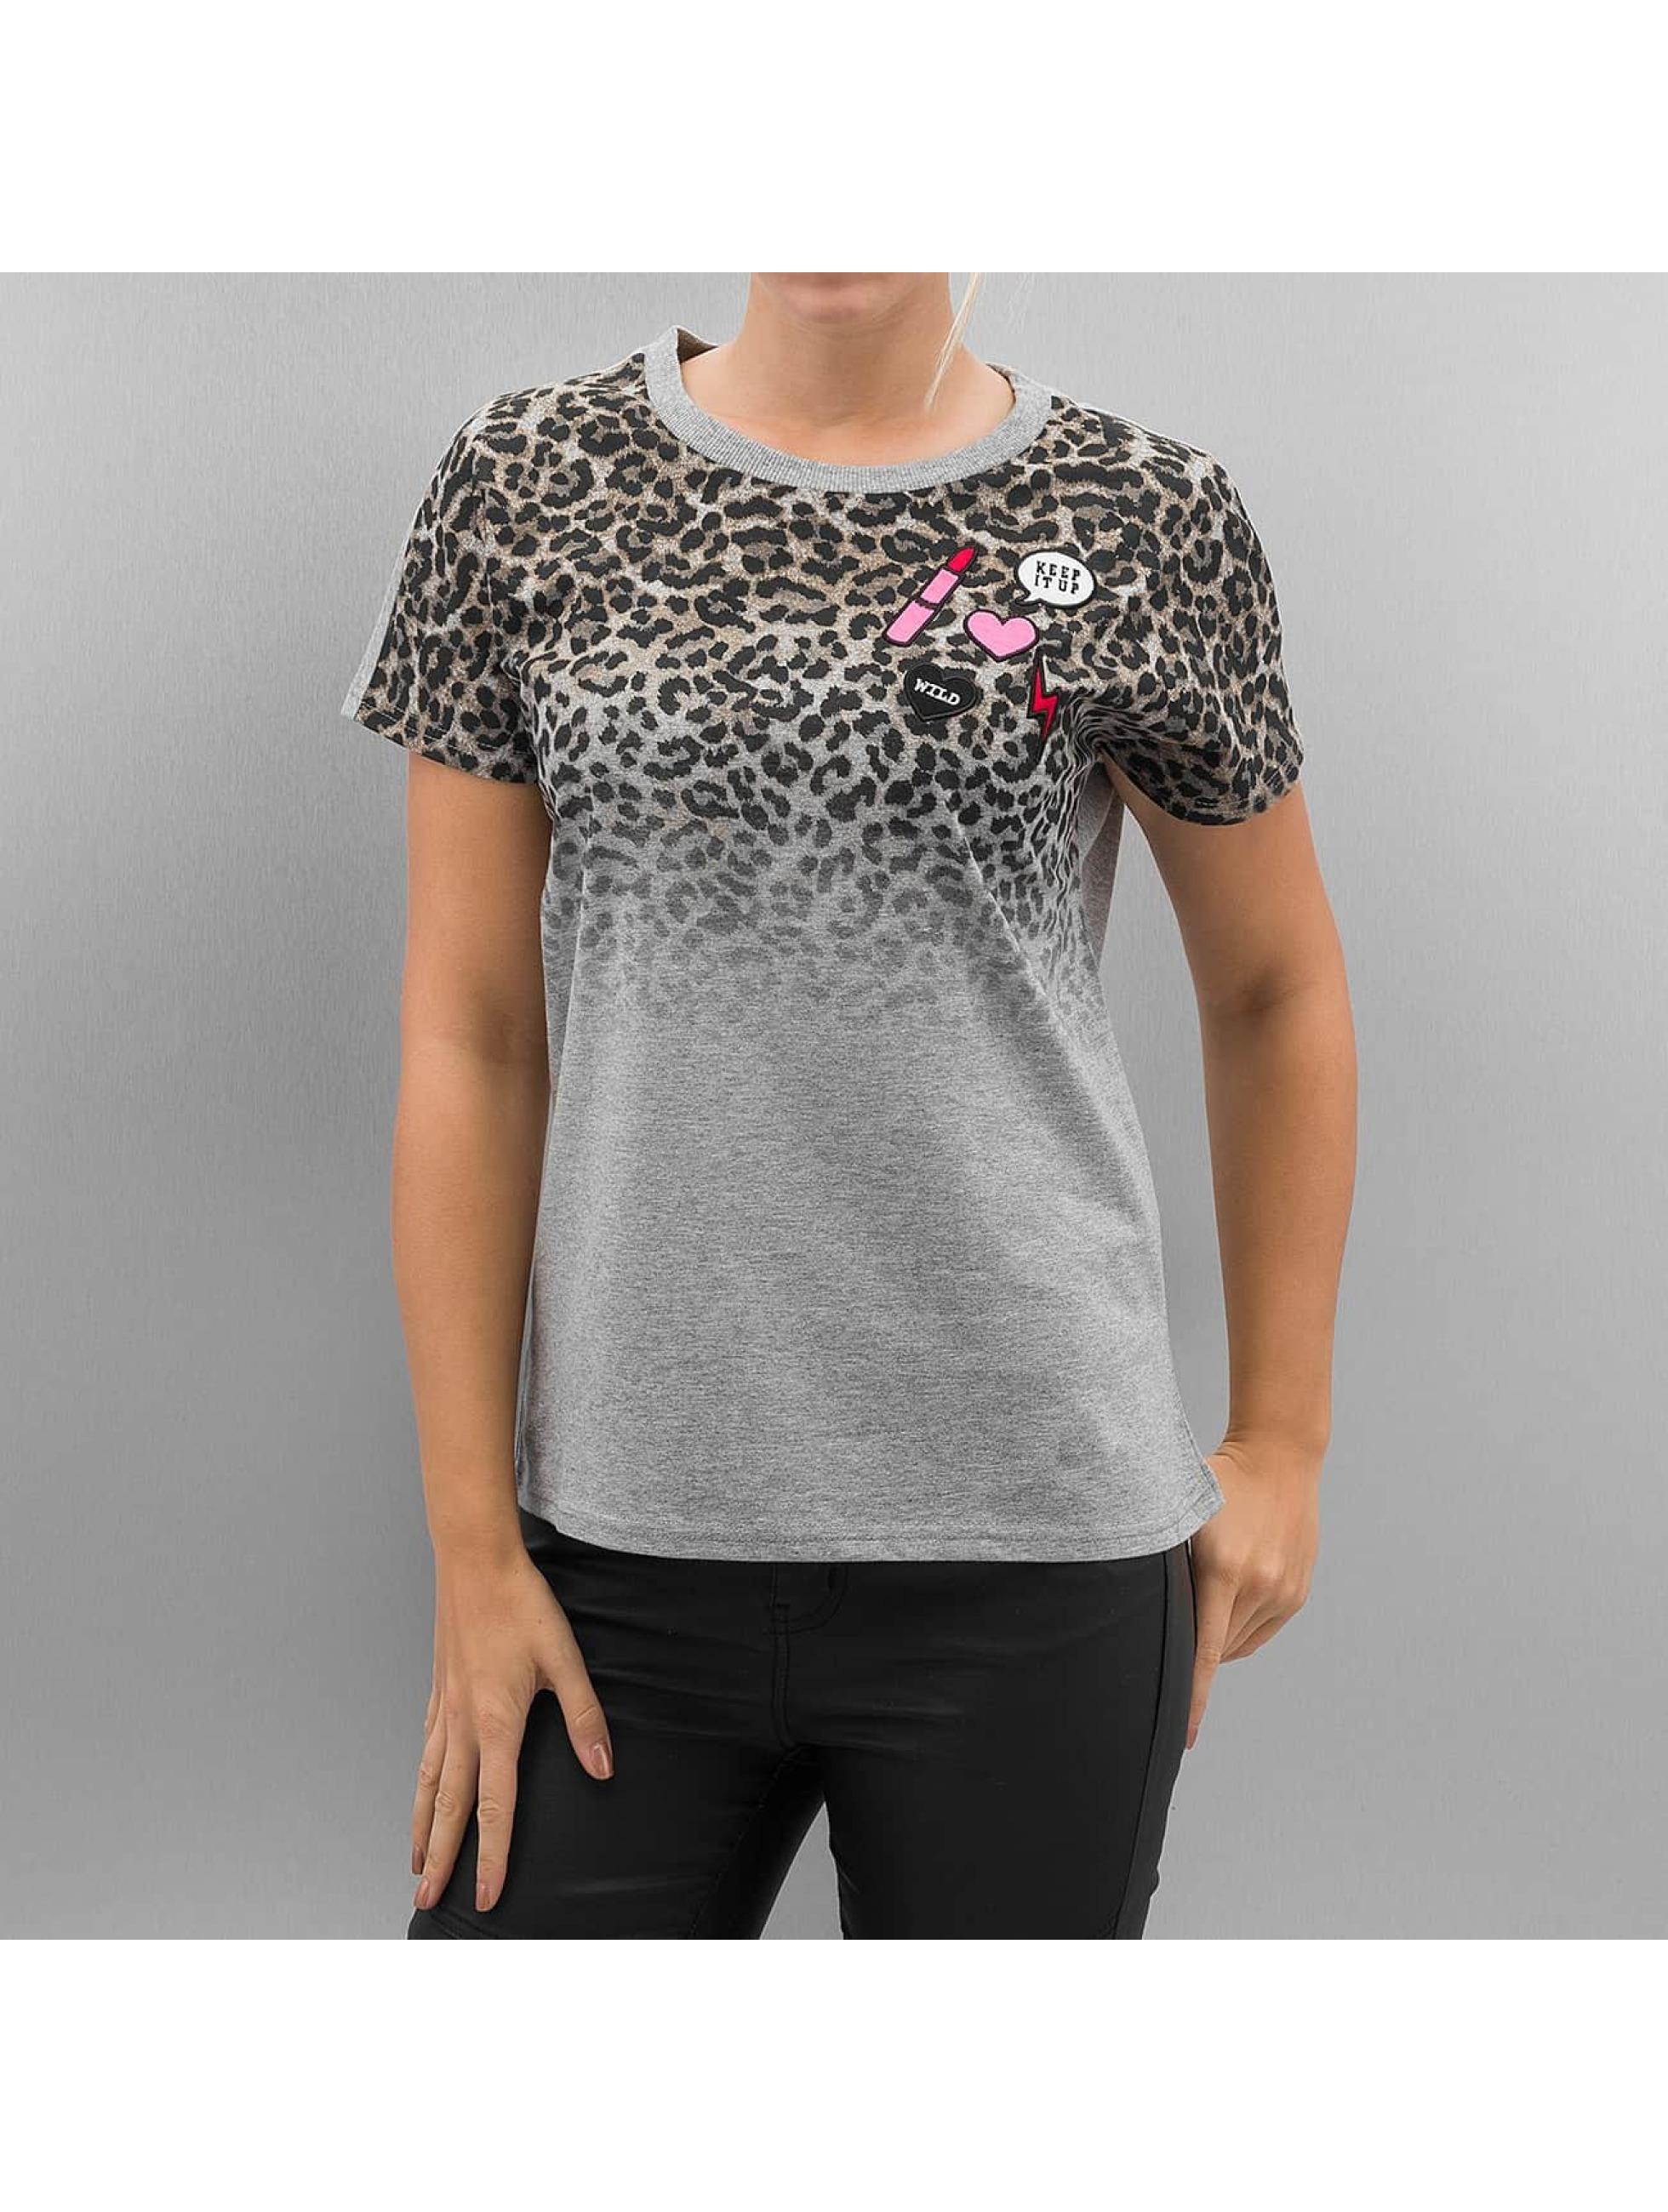 Only onlDana Leo T-Shirt Light Grey Denim Sale Angebote Reuthen